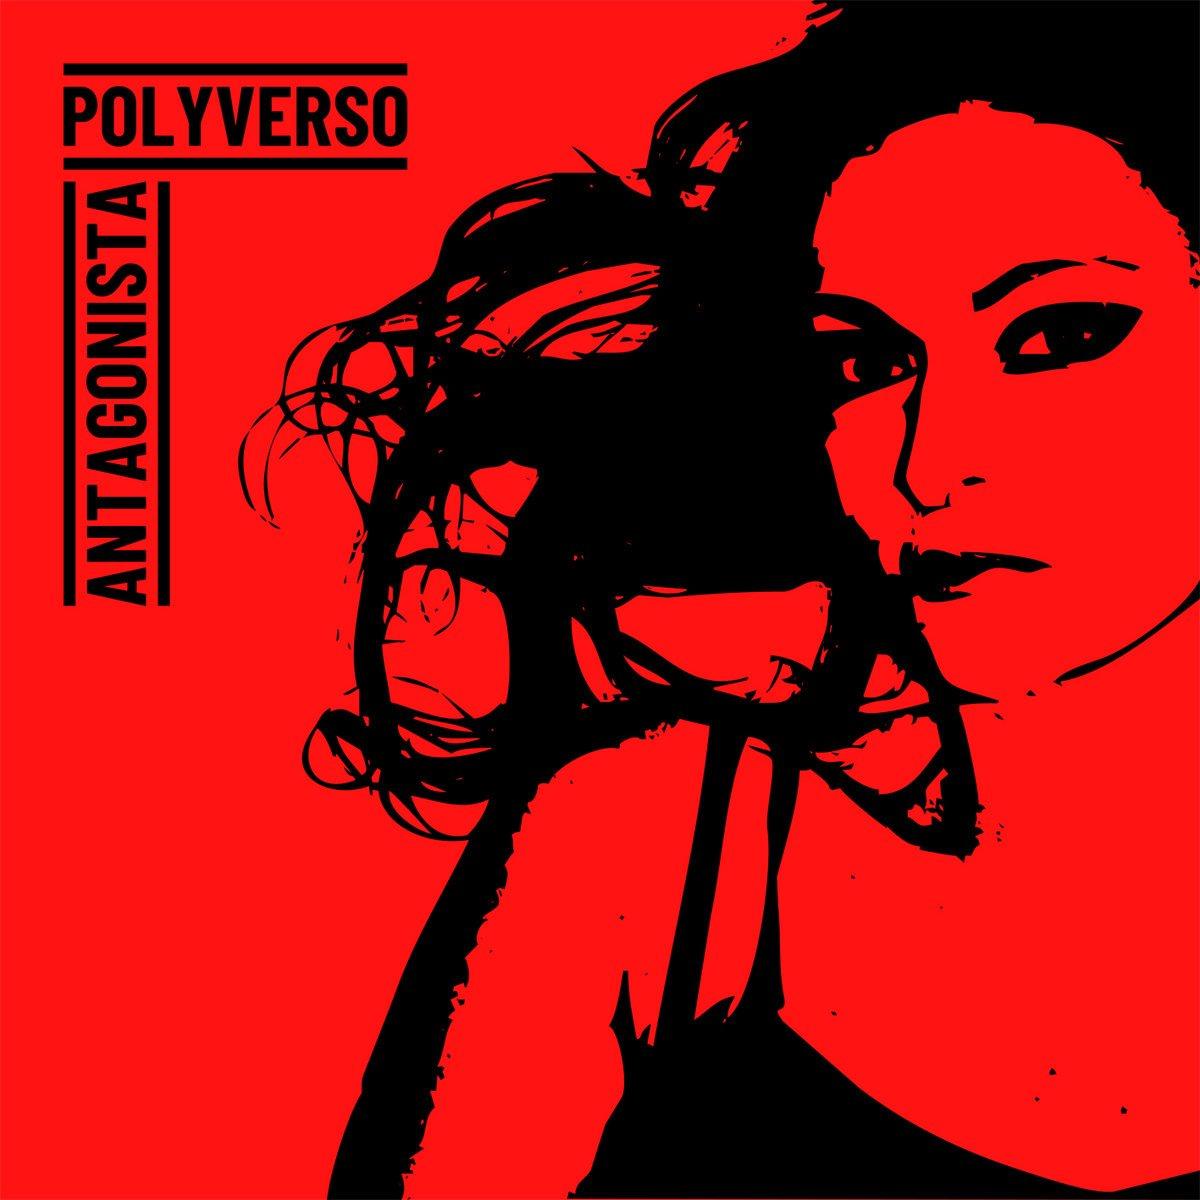 polyverso